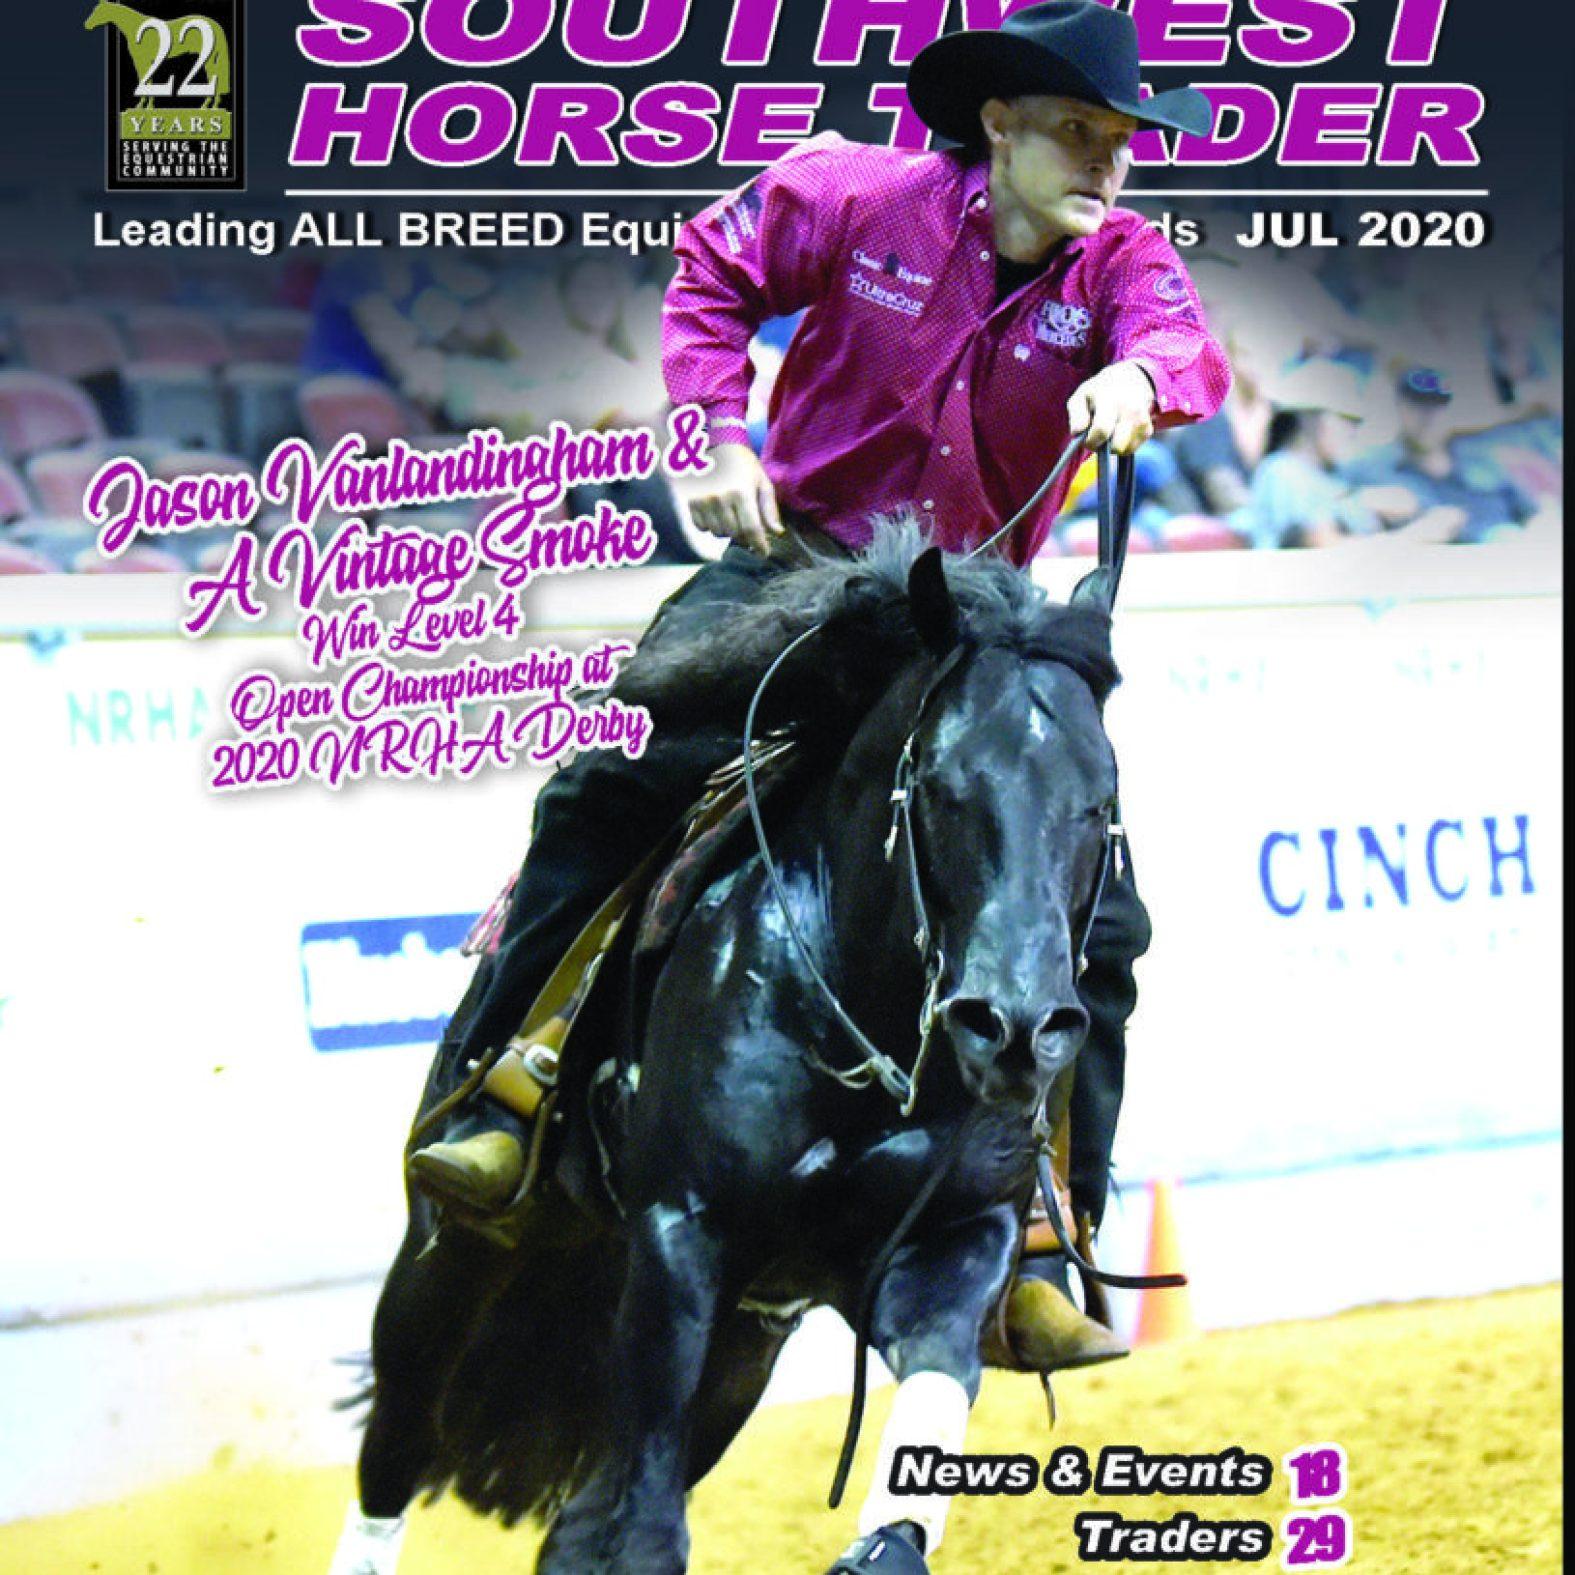 SouthWest Horse Trader July 2020 Issue